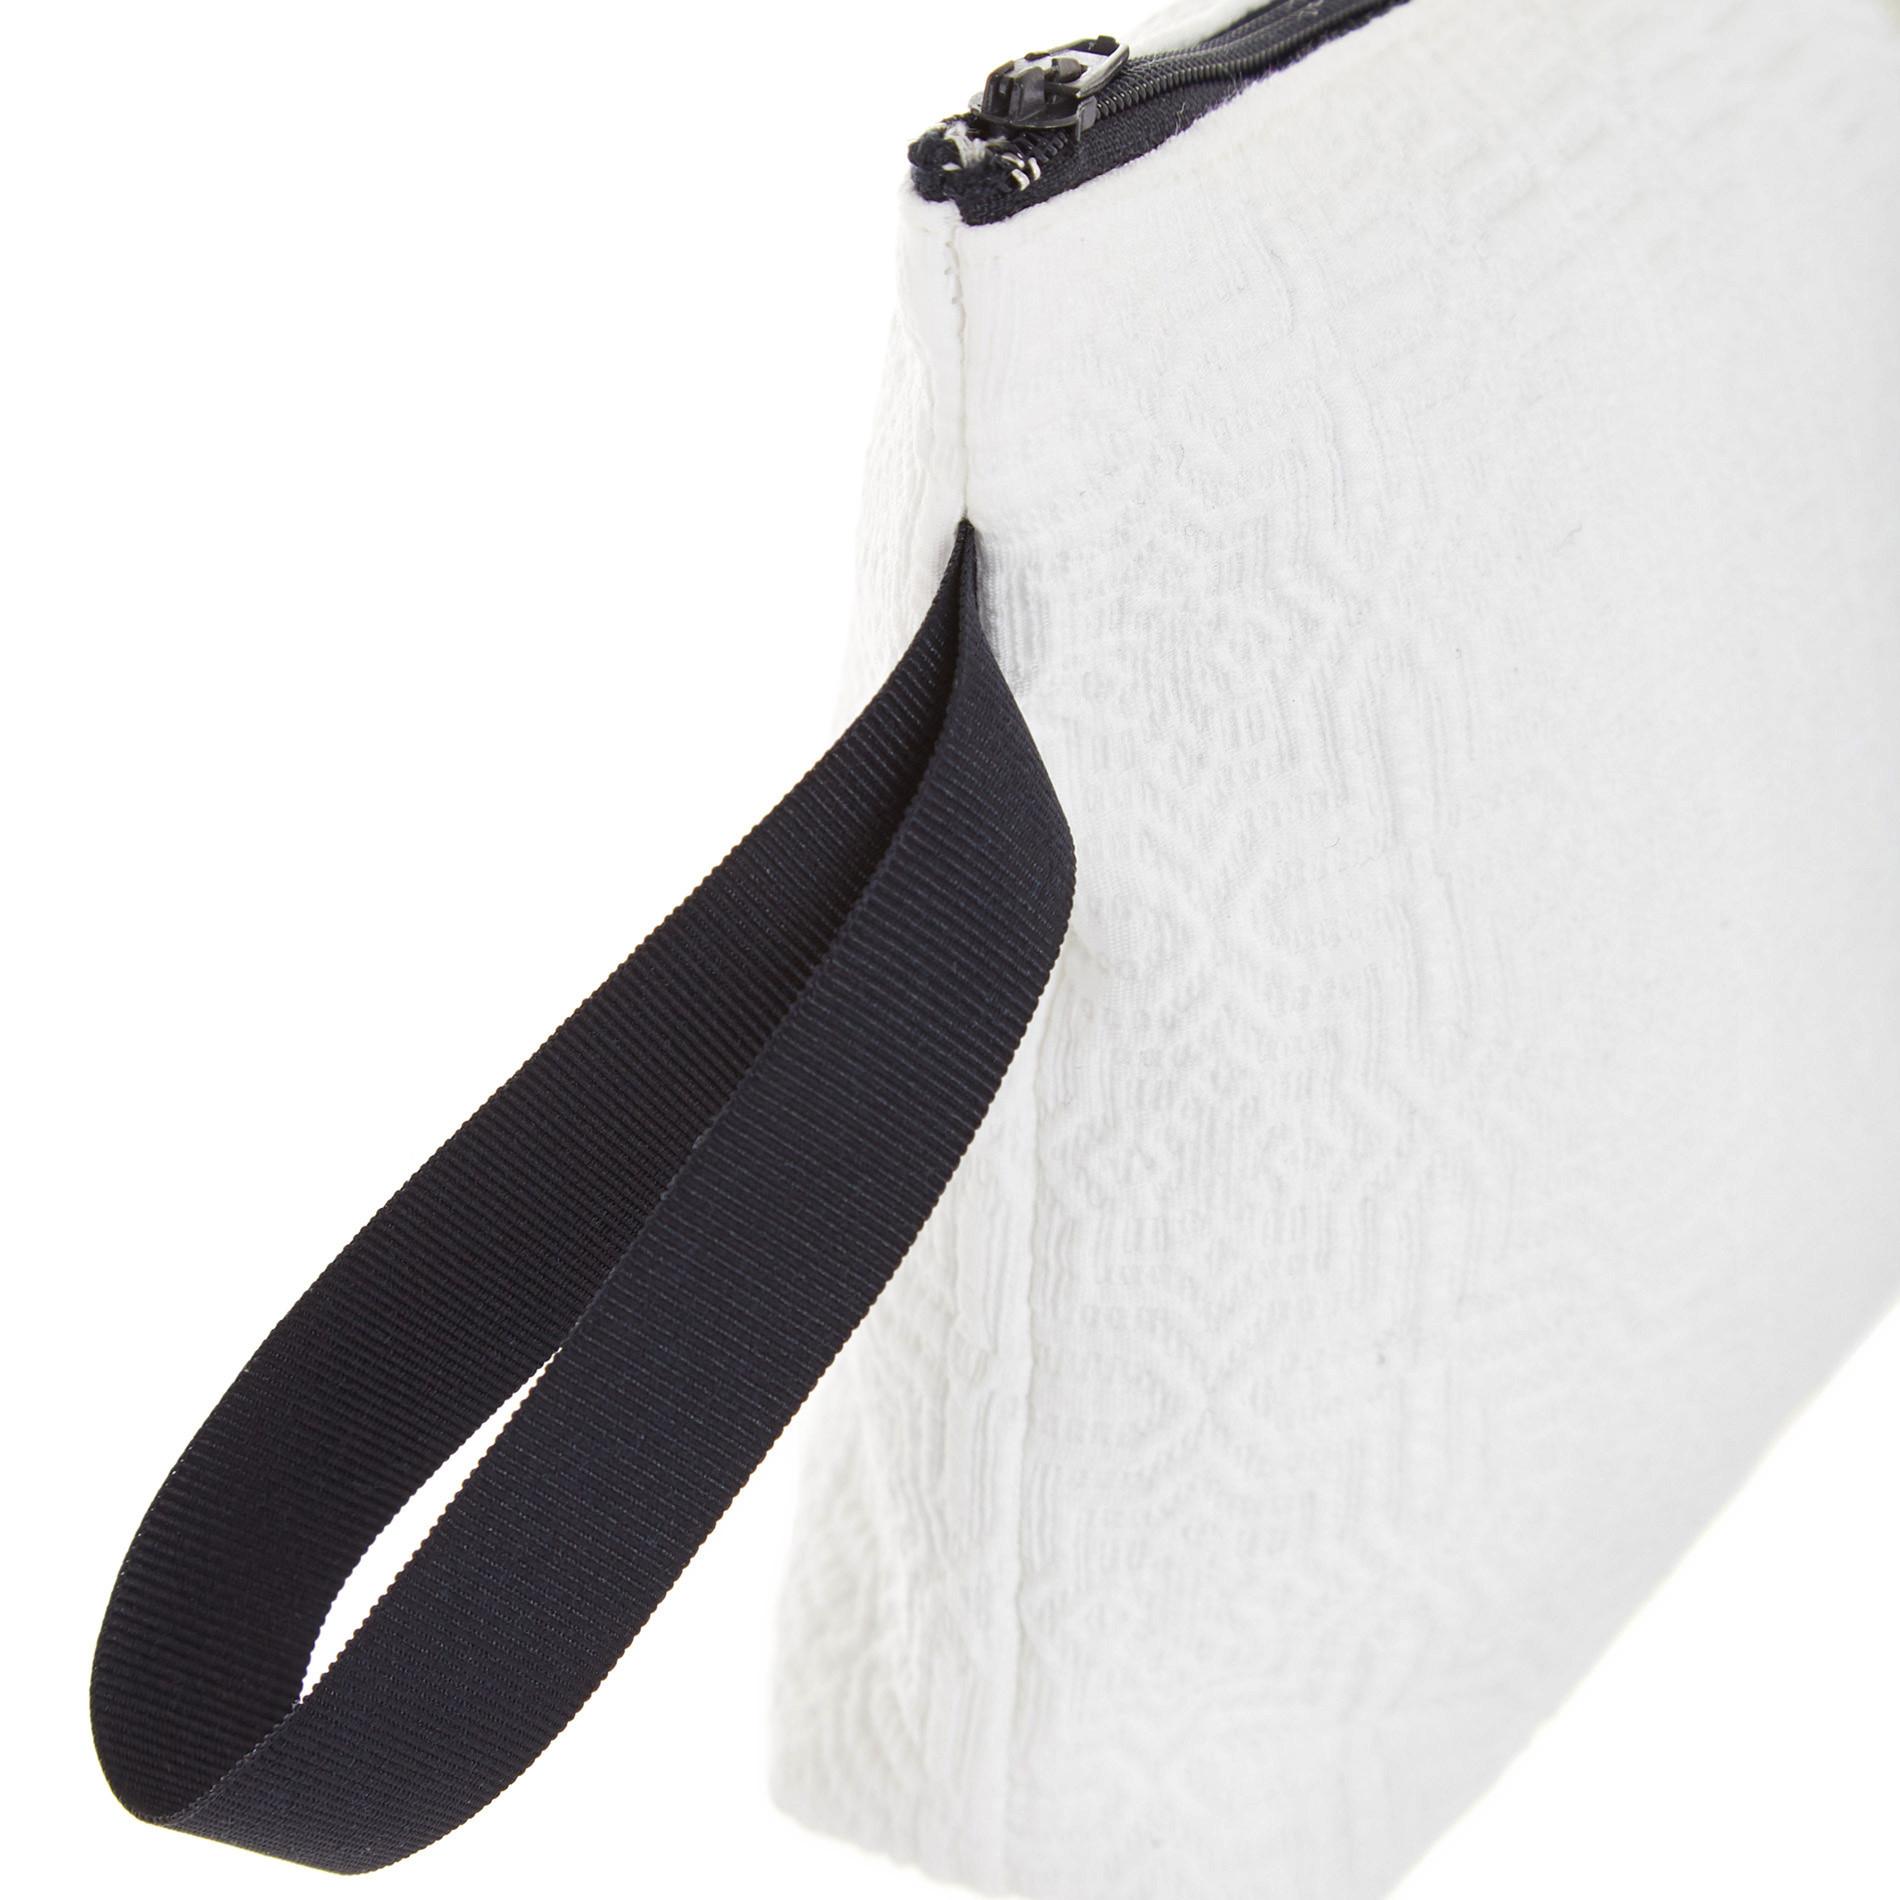 Astuccio in cotone con zip, Bianco, large image number 1